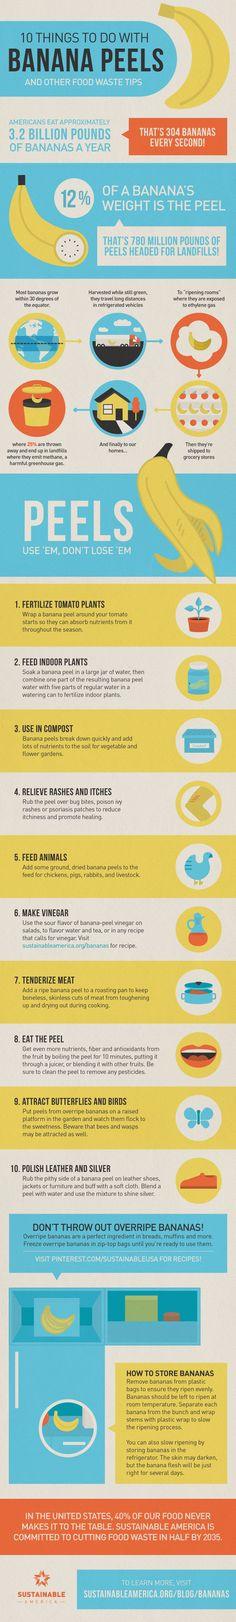 10 Things to Do With Banana Peels   #infographic #Banana #Waste #DIY #Environment